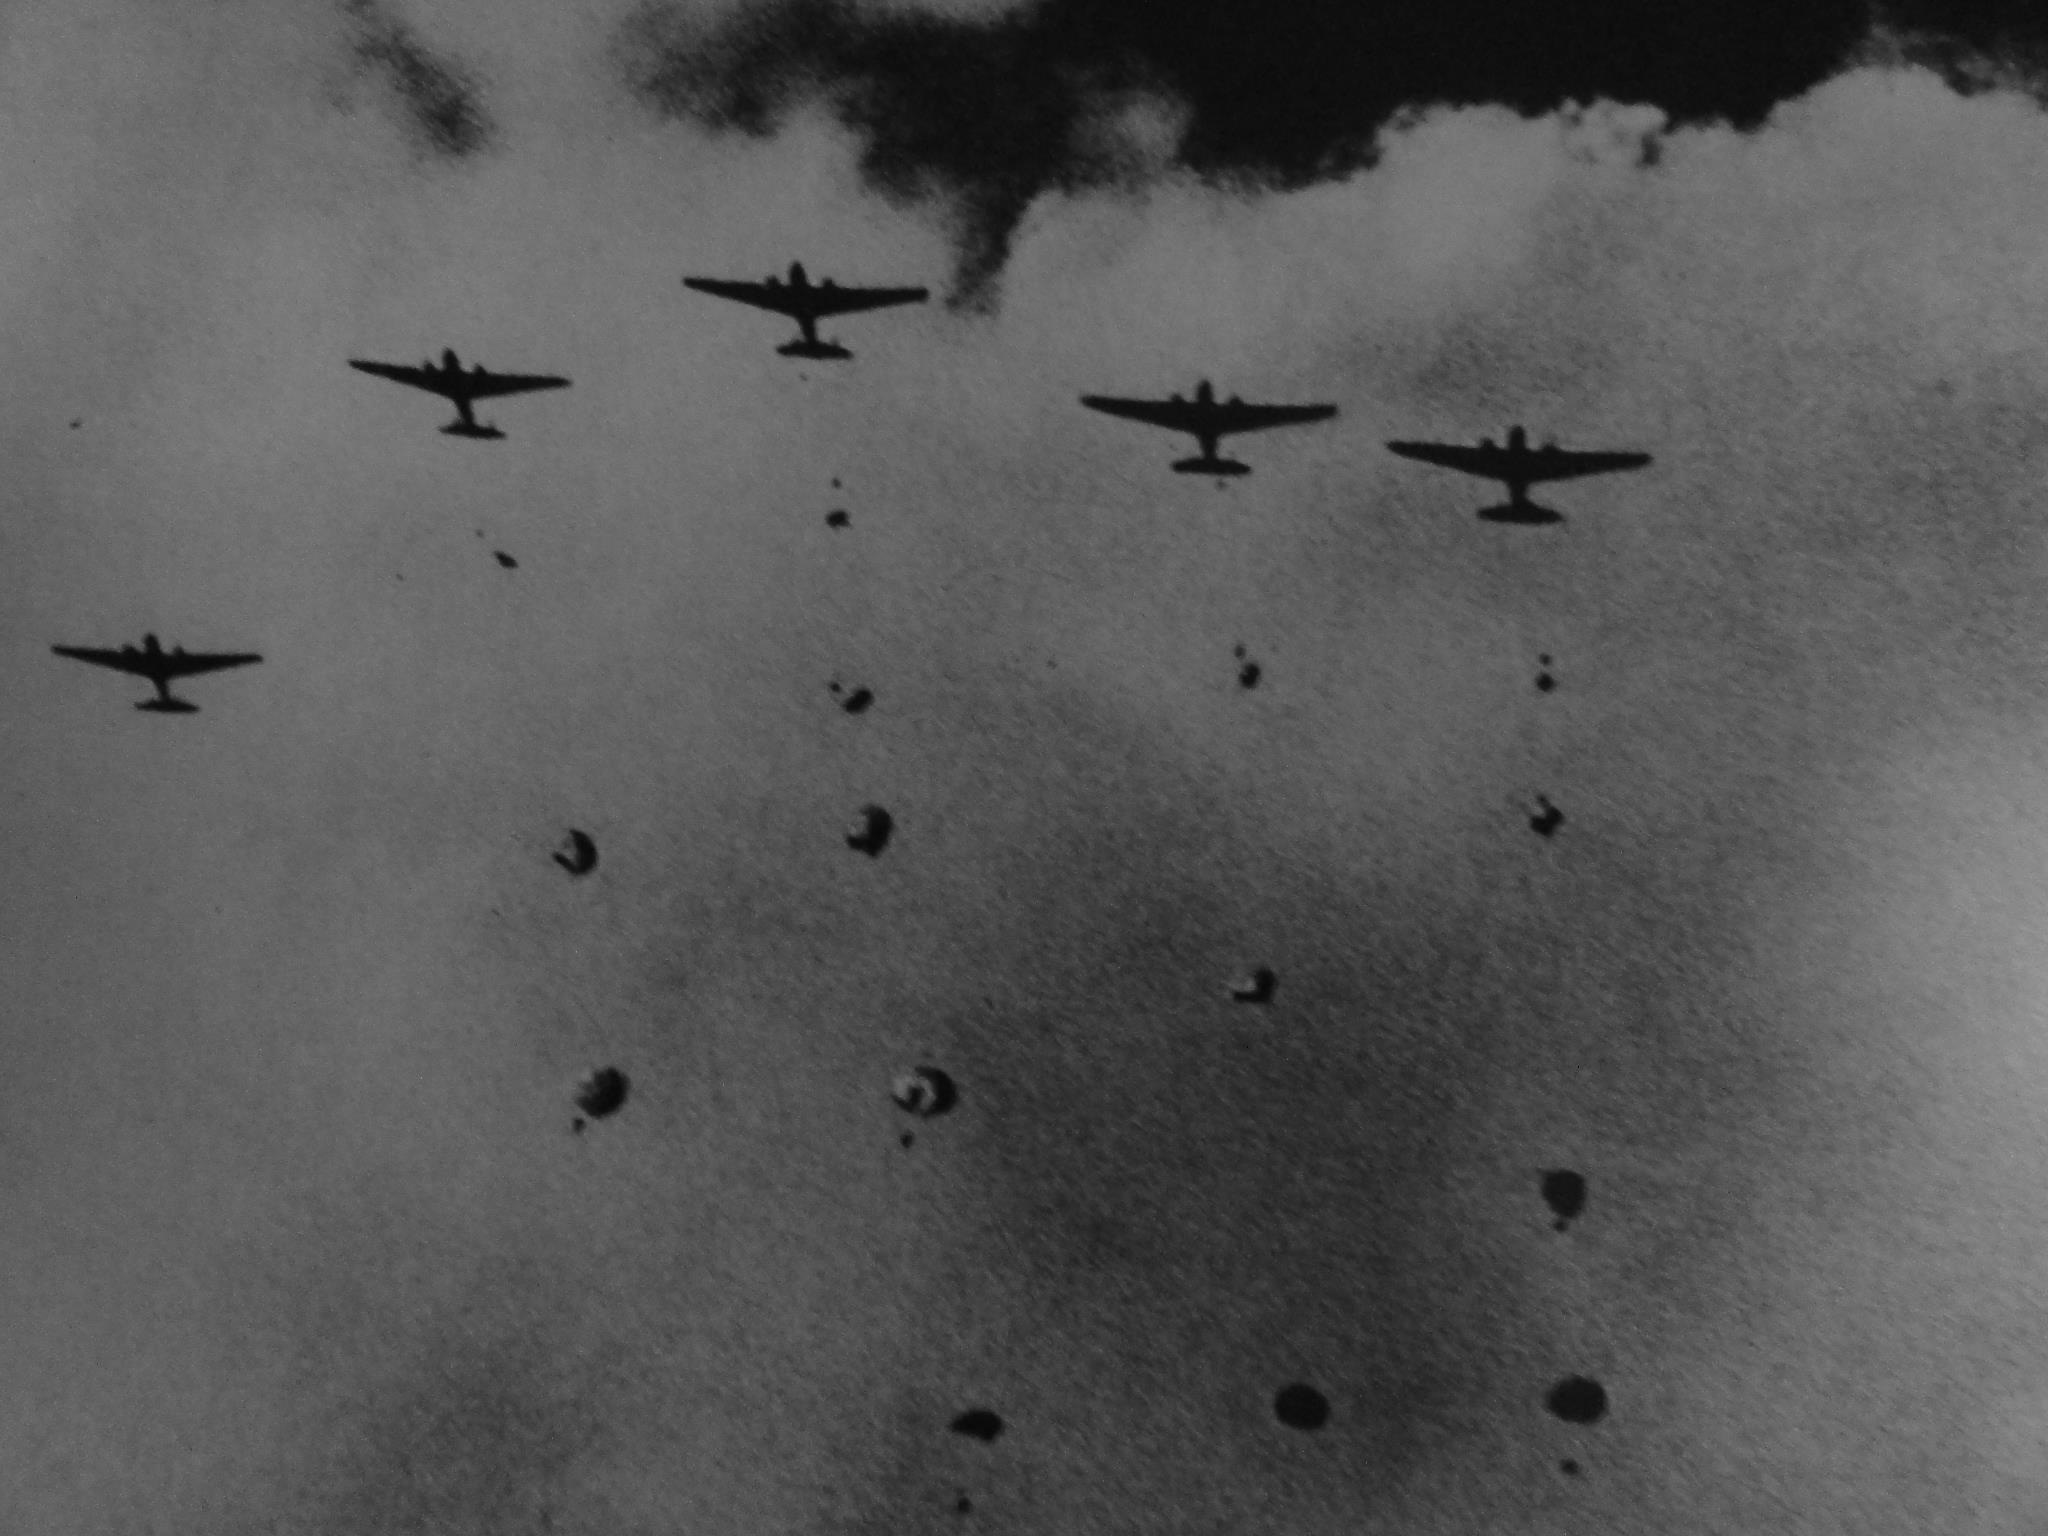 Japanese paratroopers landing in Sumatra, Dutch East Indies, 13 Feb 1942 (Japanese Navy photo)